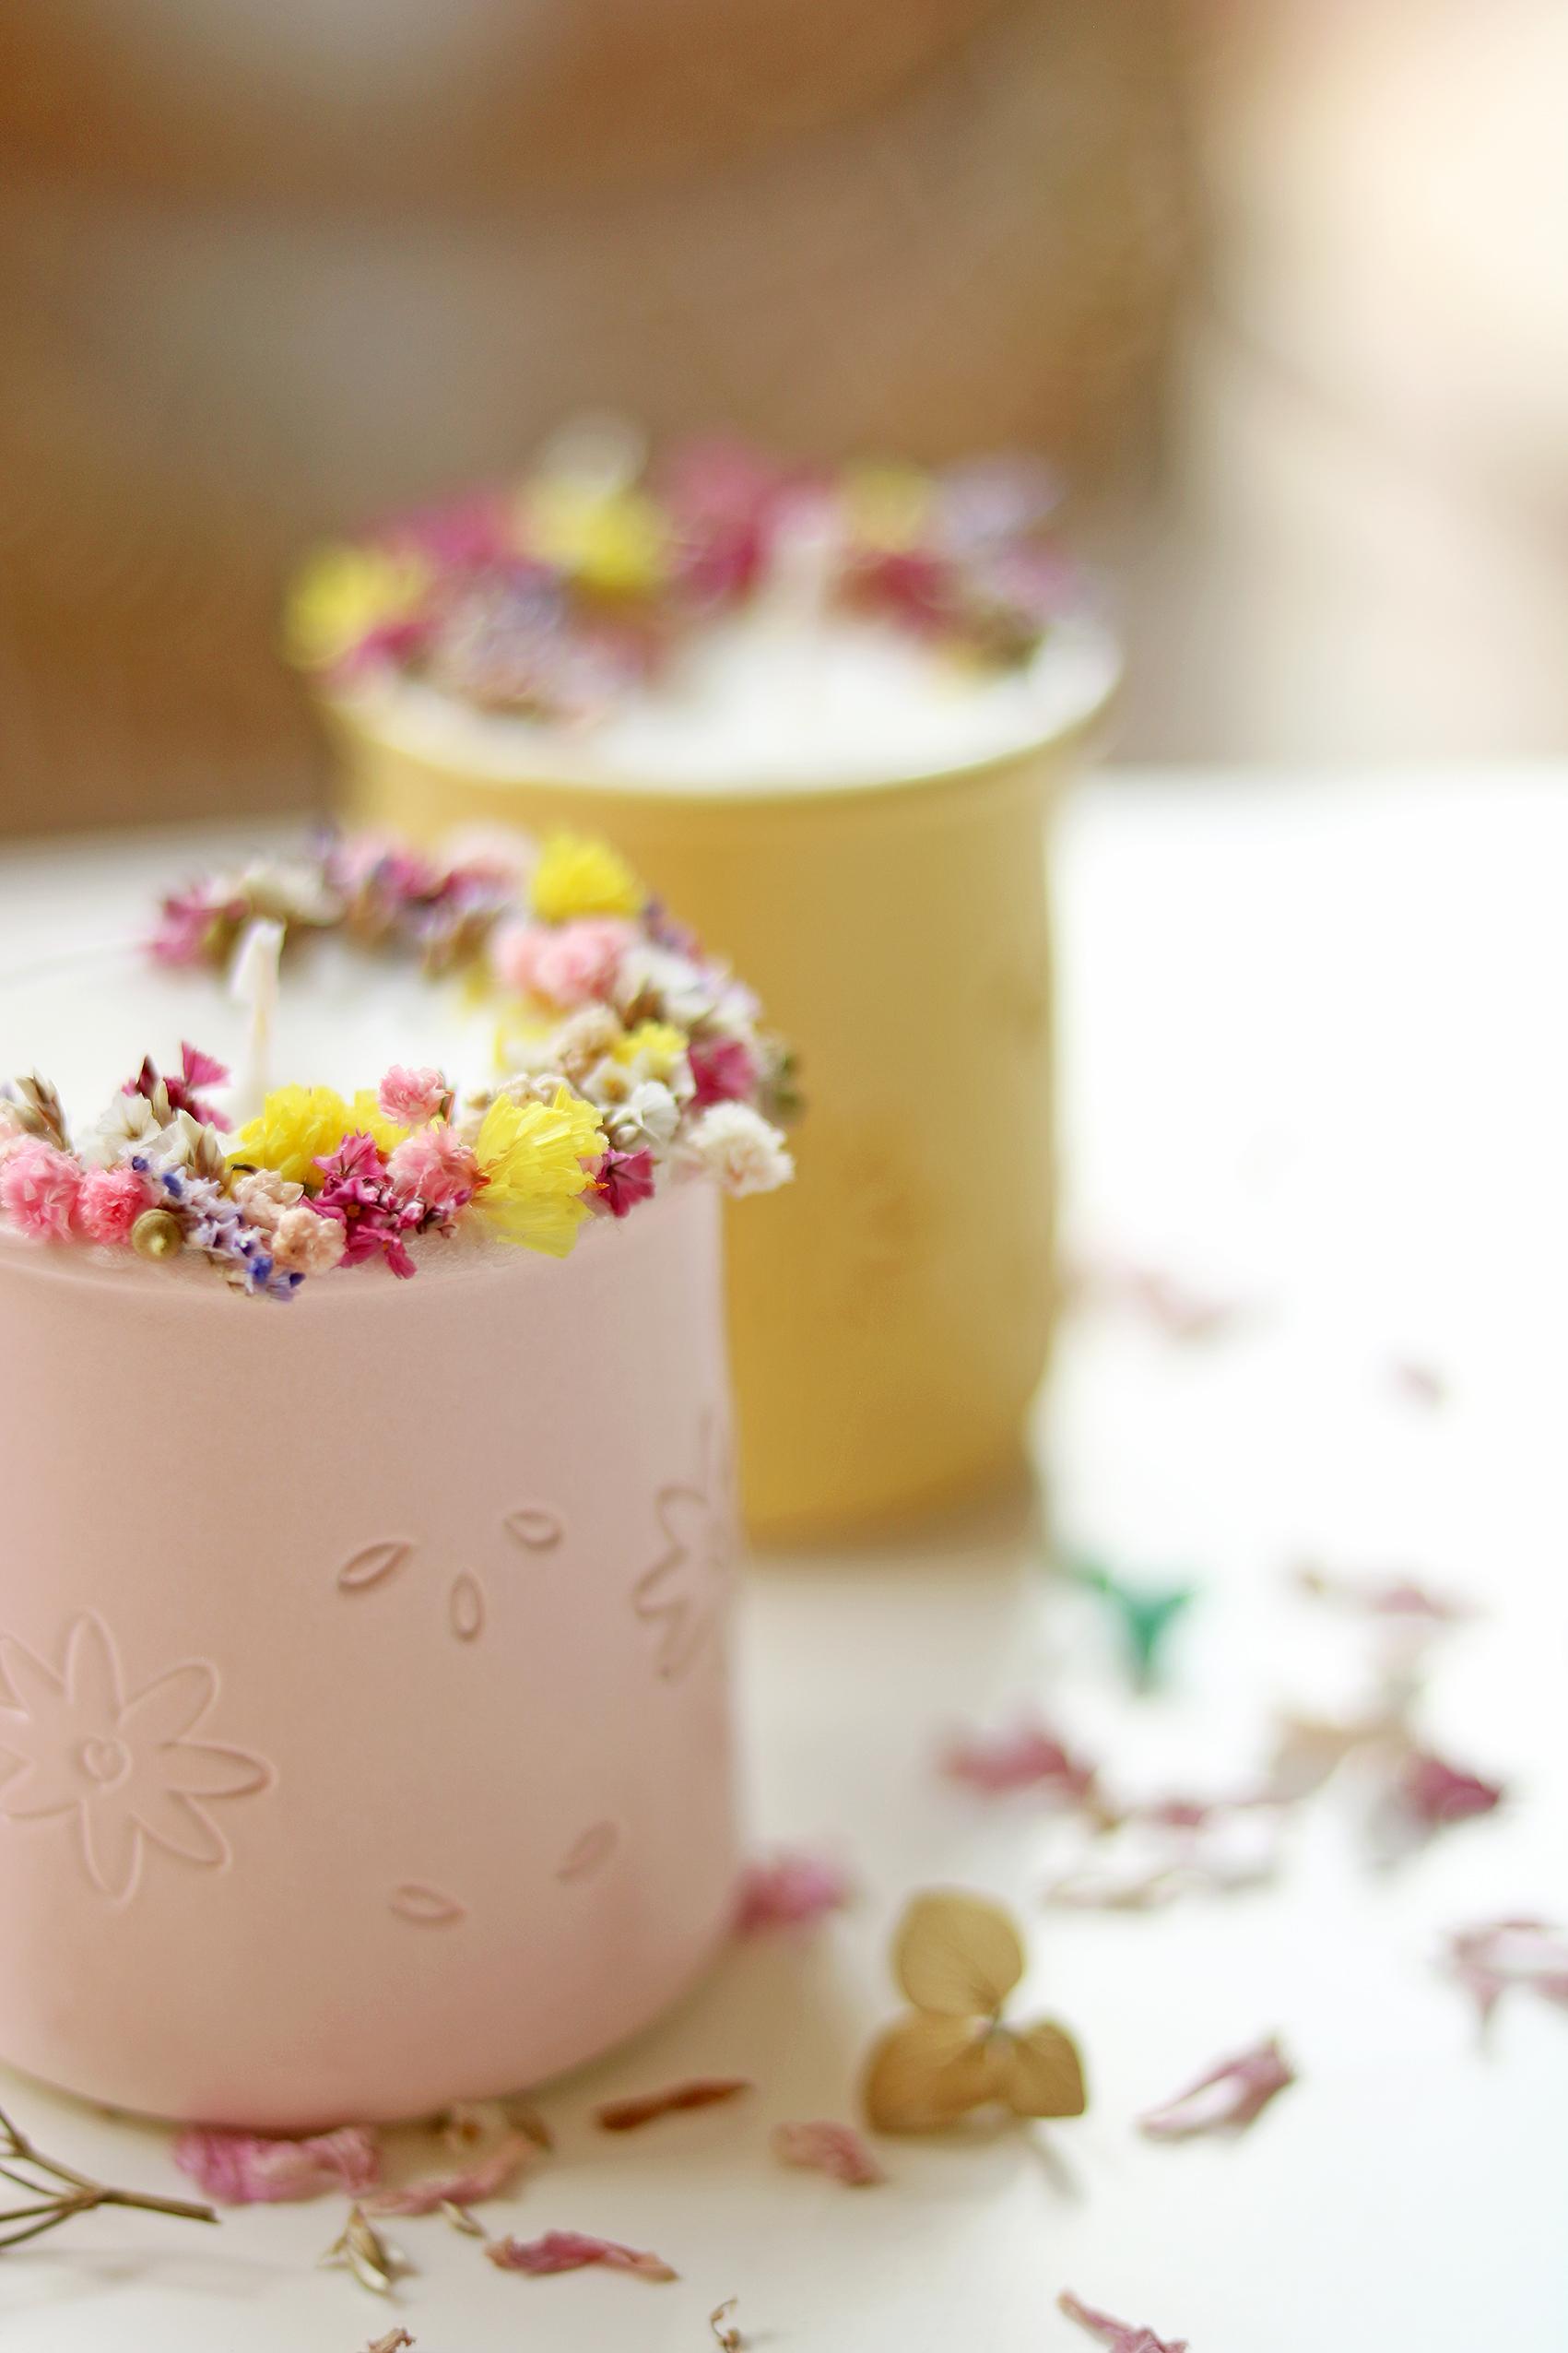 DIY-pot-la-fermière-bougies-fleuries